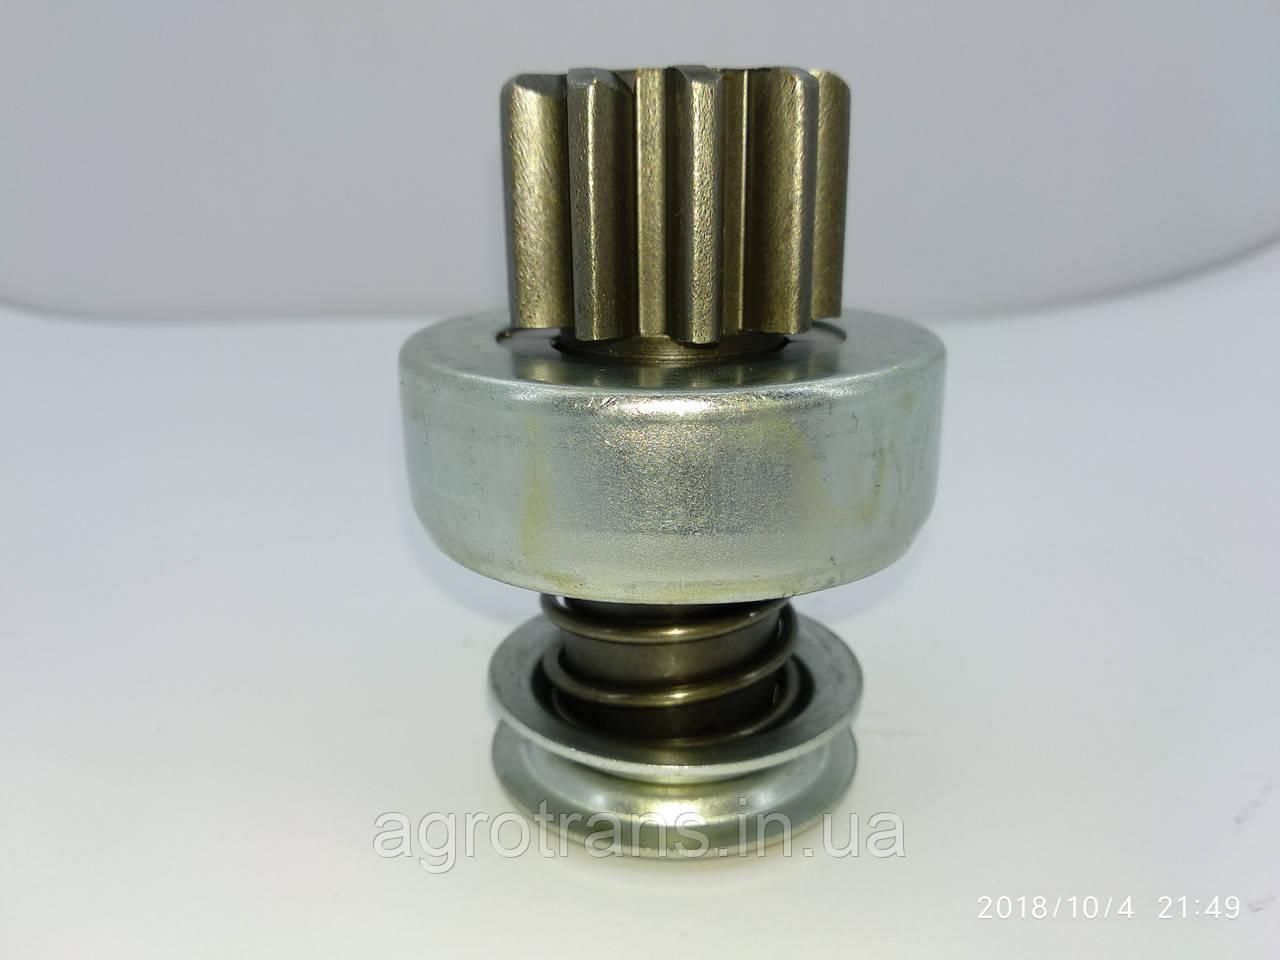 Бендикс 74/7402 12/24В MT3 7402.3708600 Привод стартера